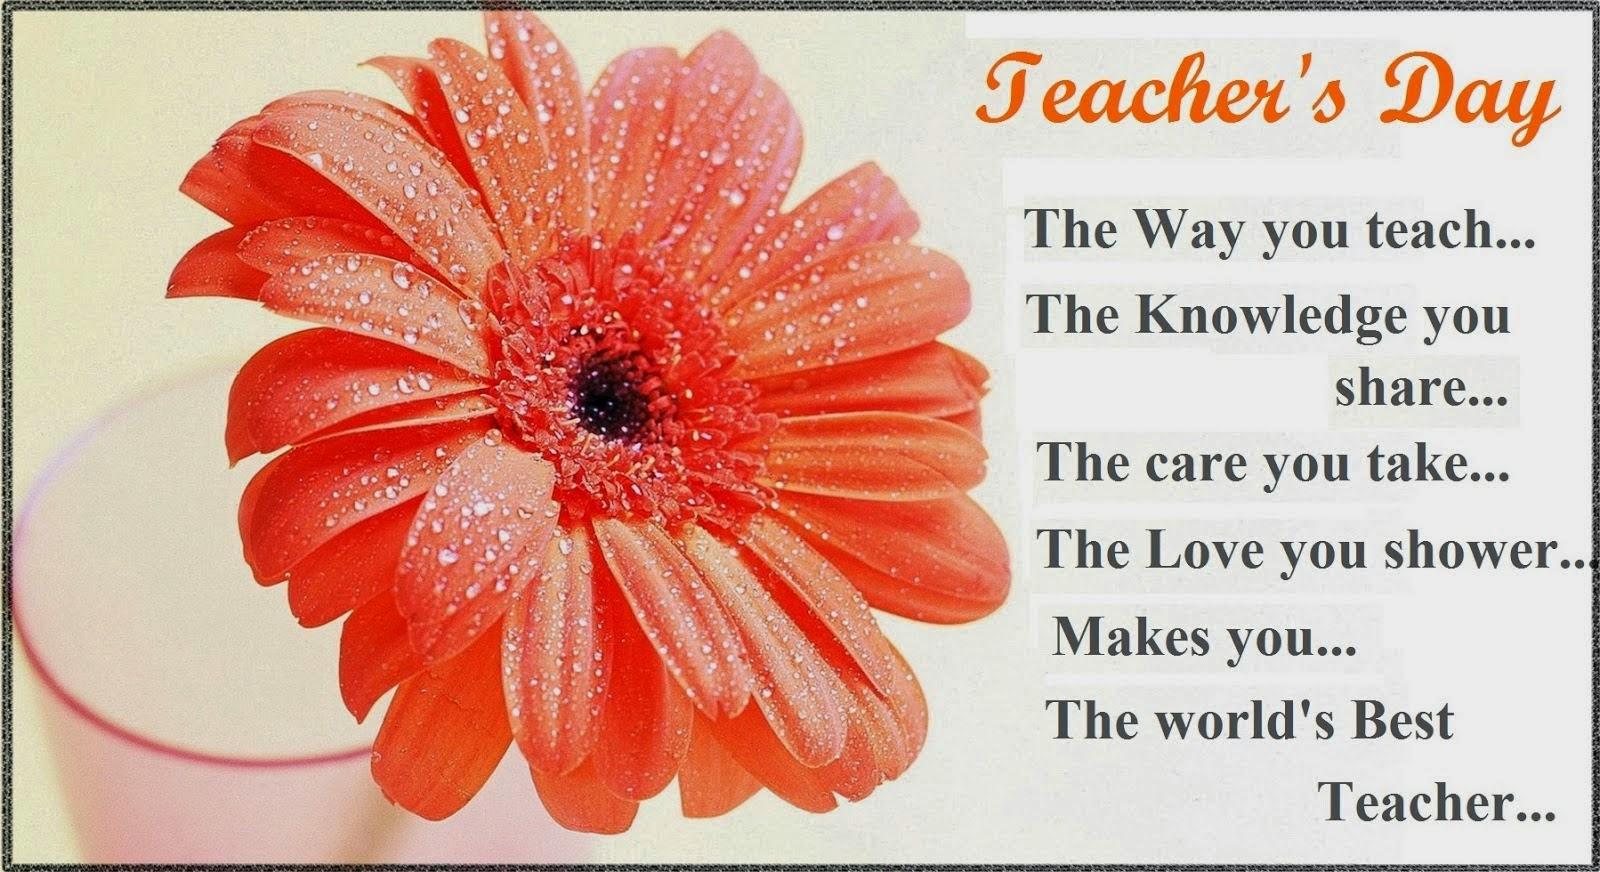 Teacher s Day 2015 - Information, Date, Celebrations